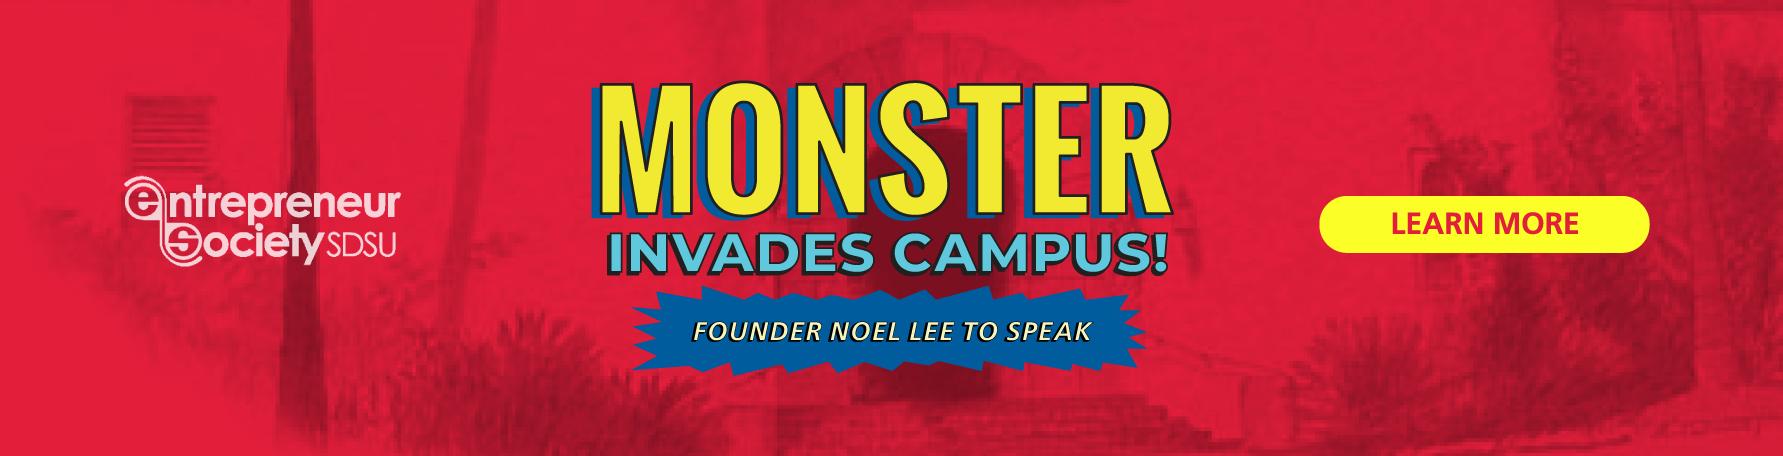 Noel Lee Founder of Monster Spoke on Campus